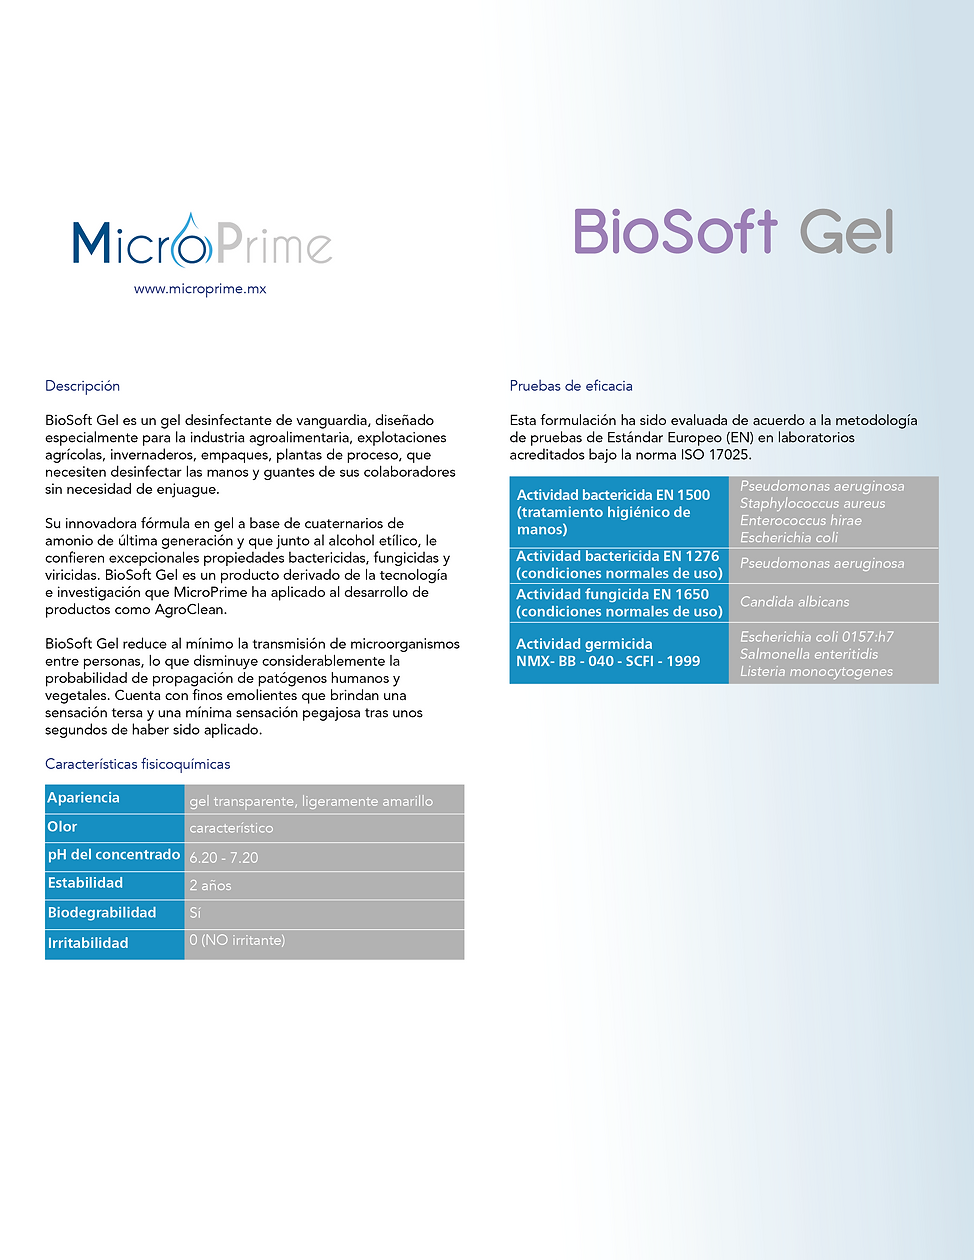 FT_BioSoft Gel-2020 (1).png